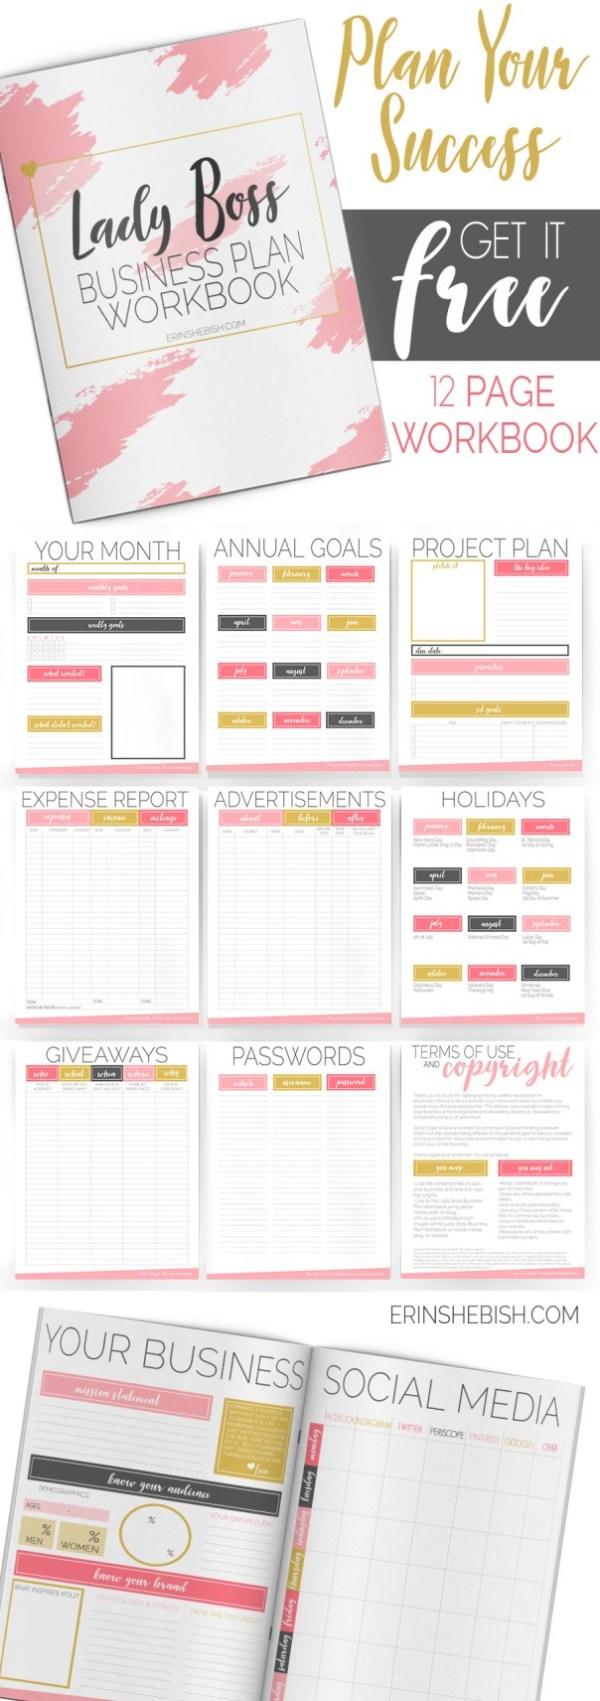 blog planner 2